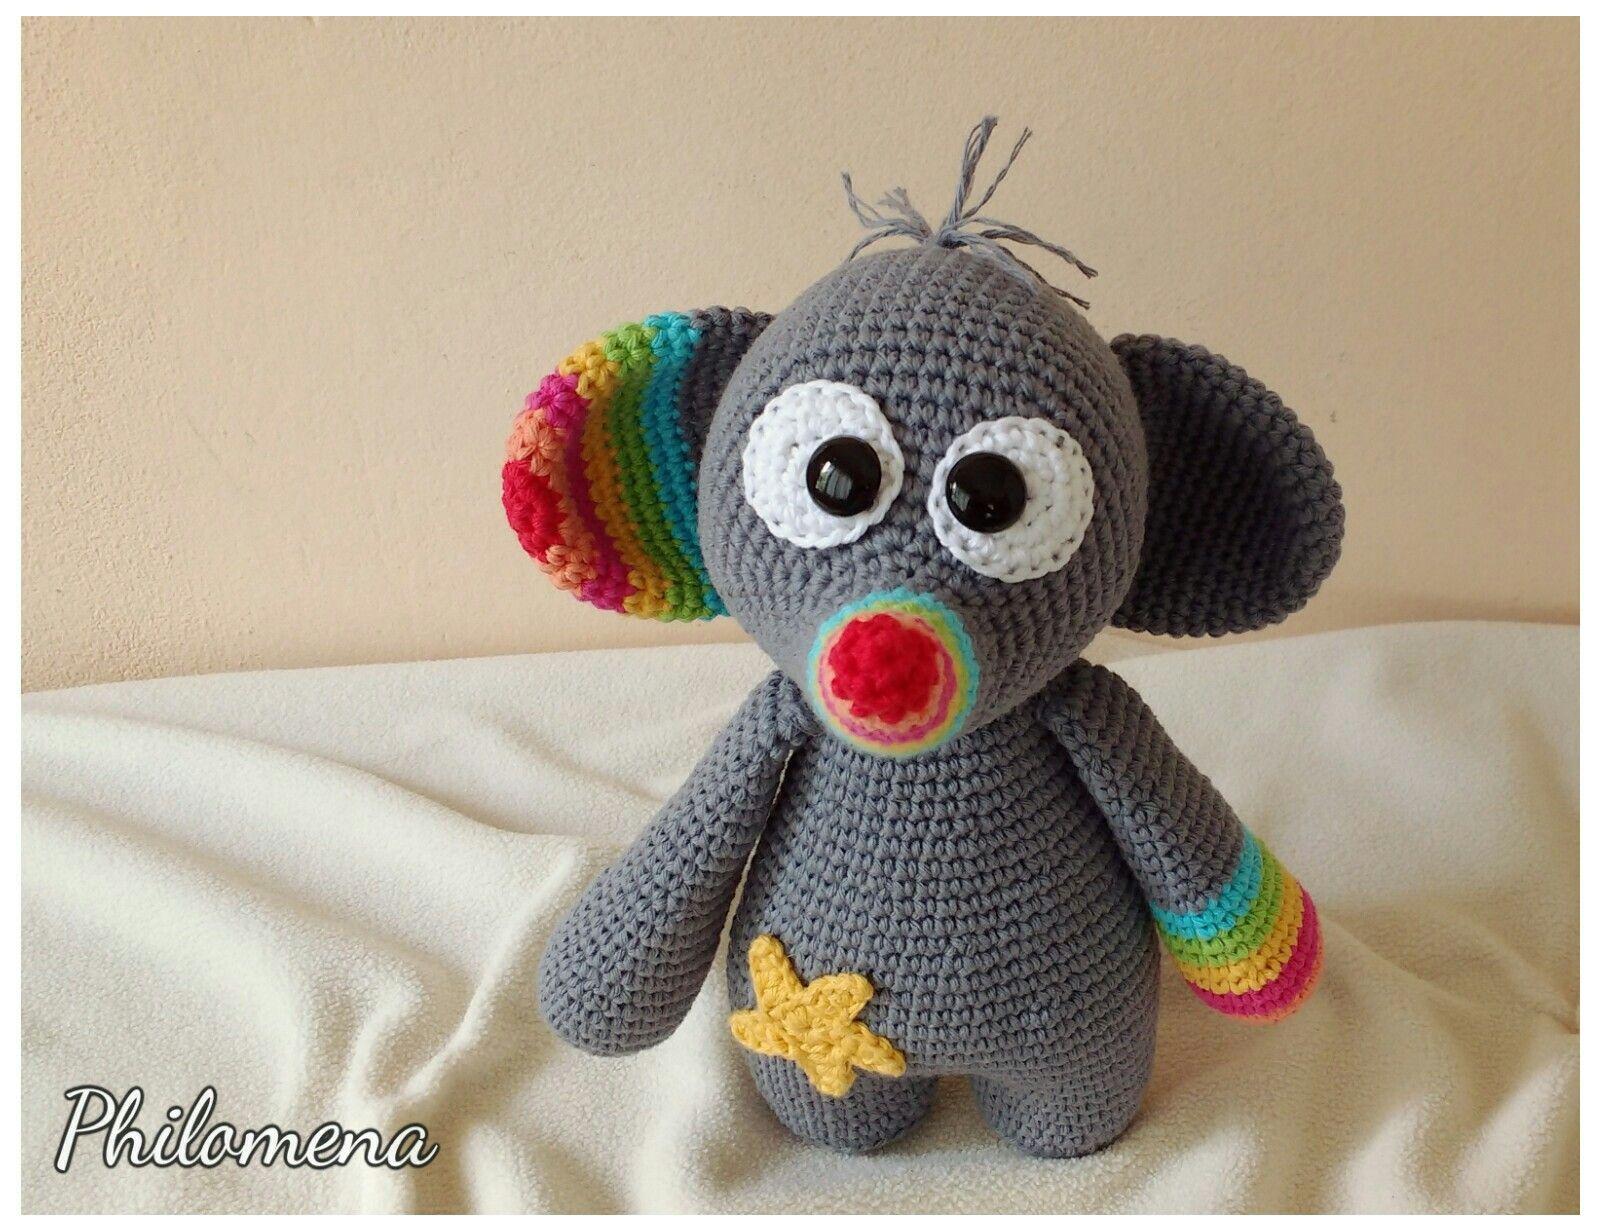 Amigurumi Voor Beginners : Elefante amigurumi by philomena игрушки amigurumi